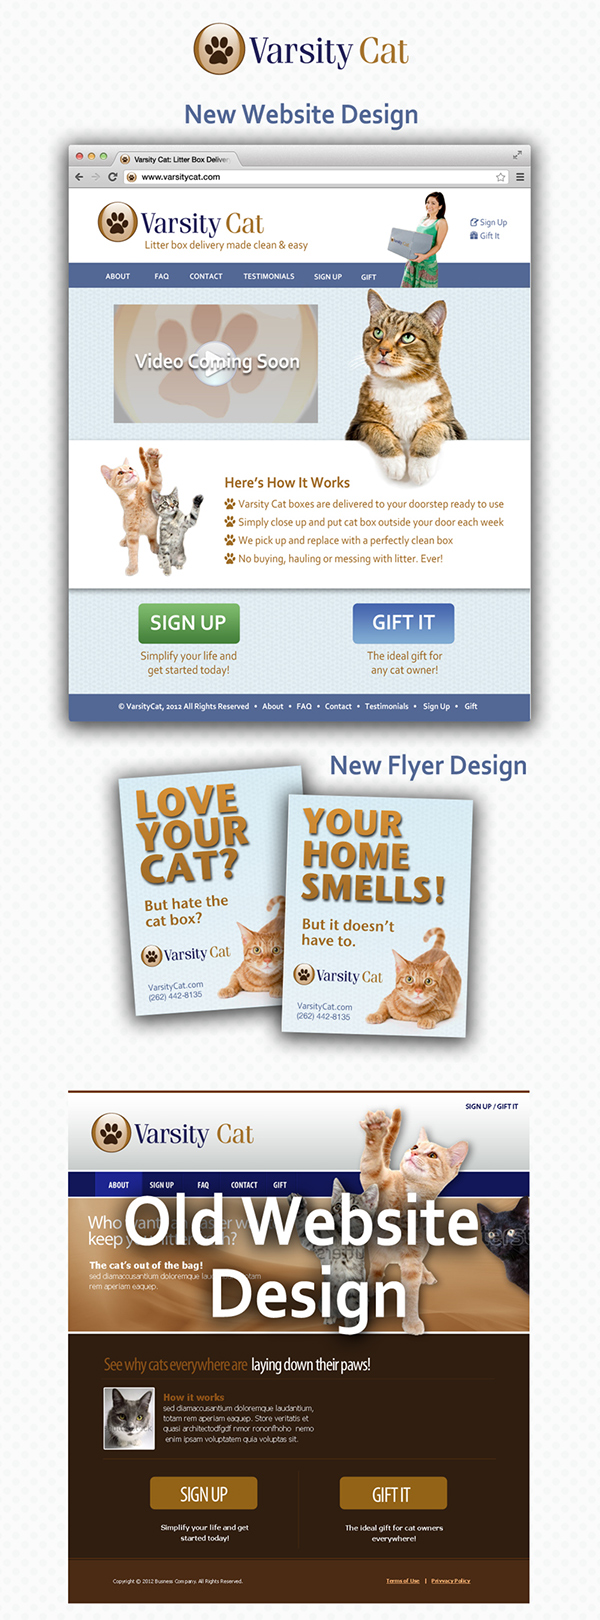 Web Design  Cat redesign Flier design Varsity Cat  Ronpershing.com